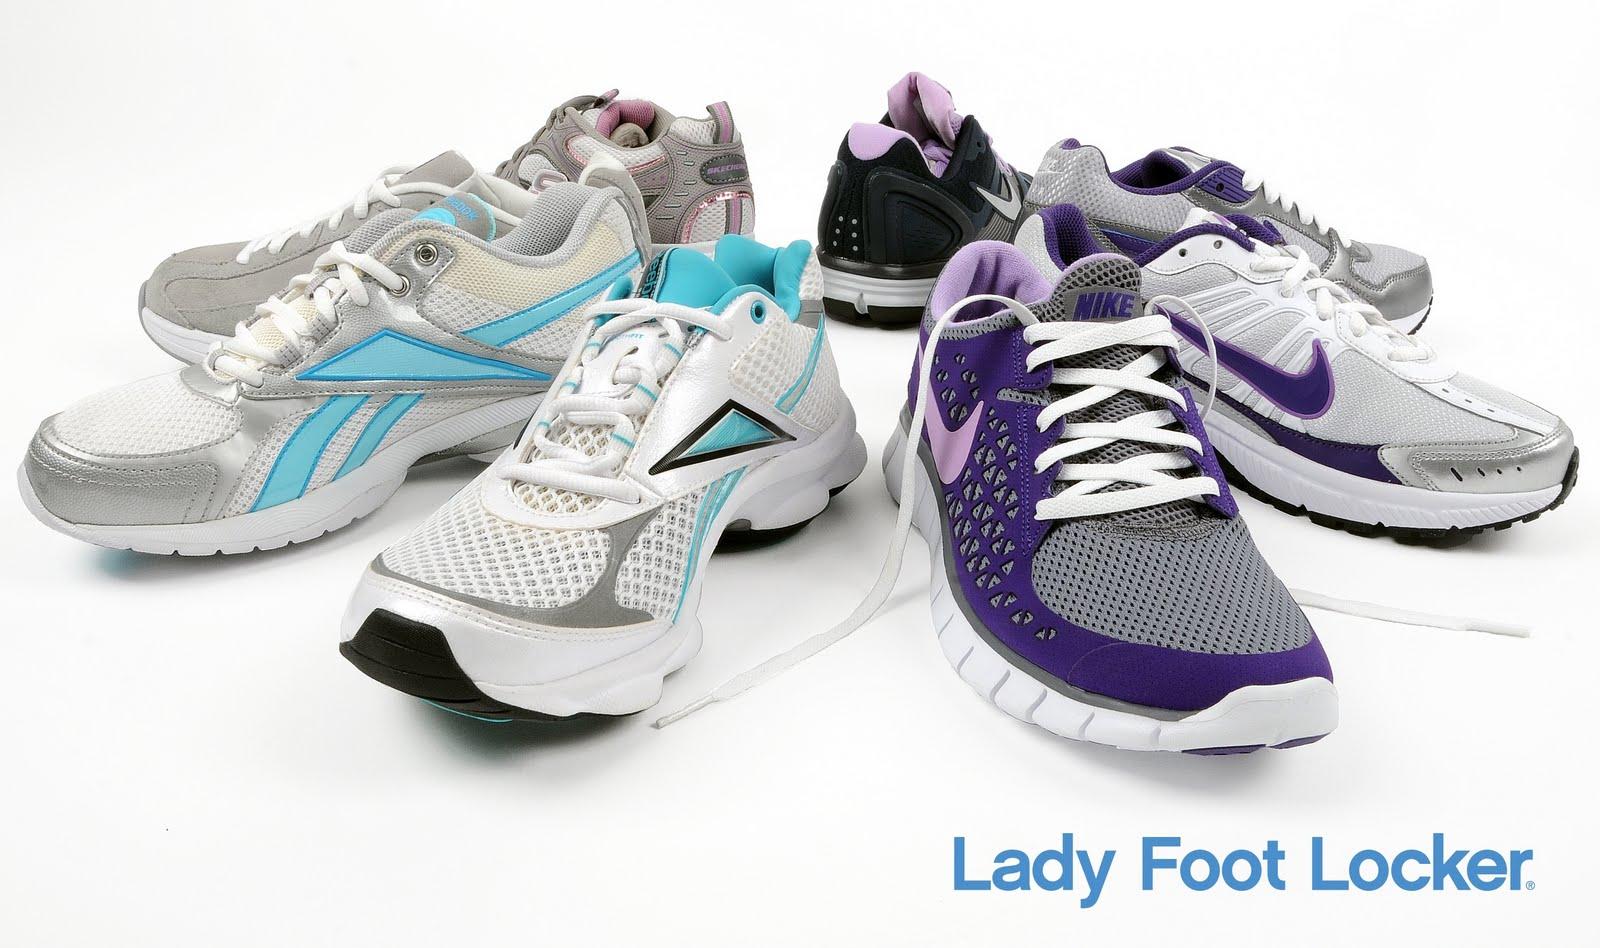 664e0b85c69a Lady foot locker sneakers   La car show discount coupons